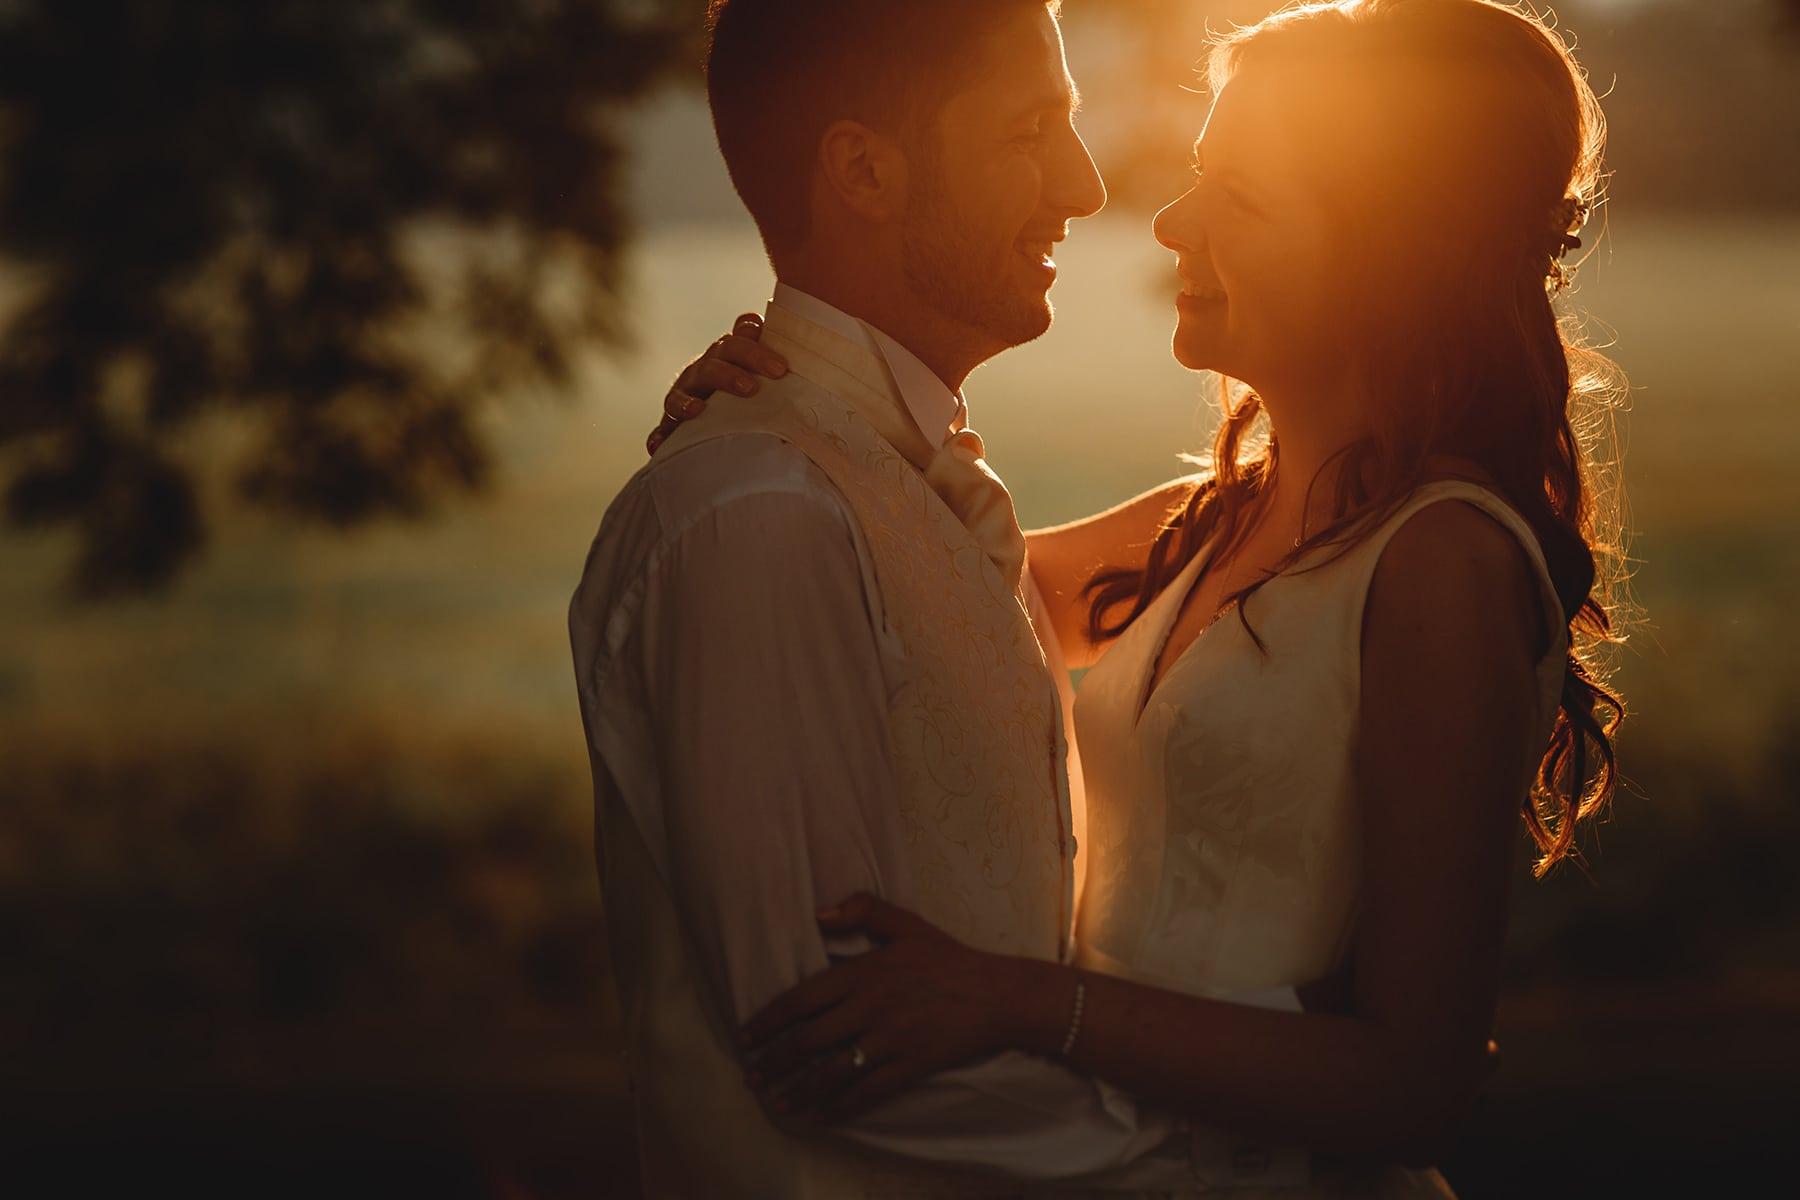 tissingotn hall wedding photos at golden hour sunset